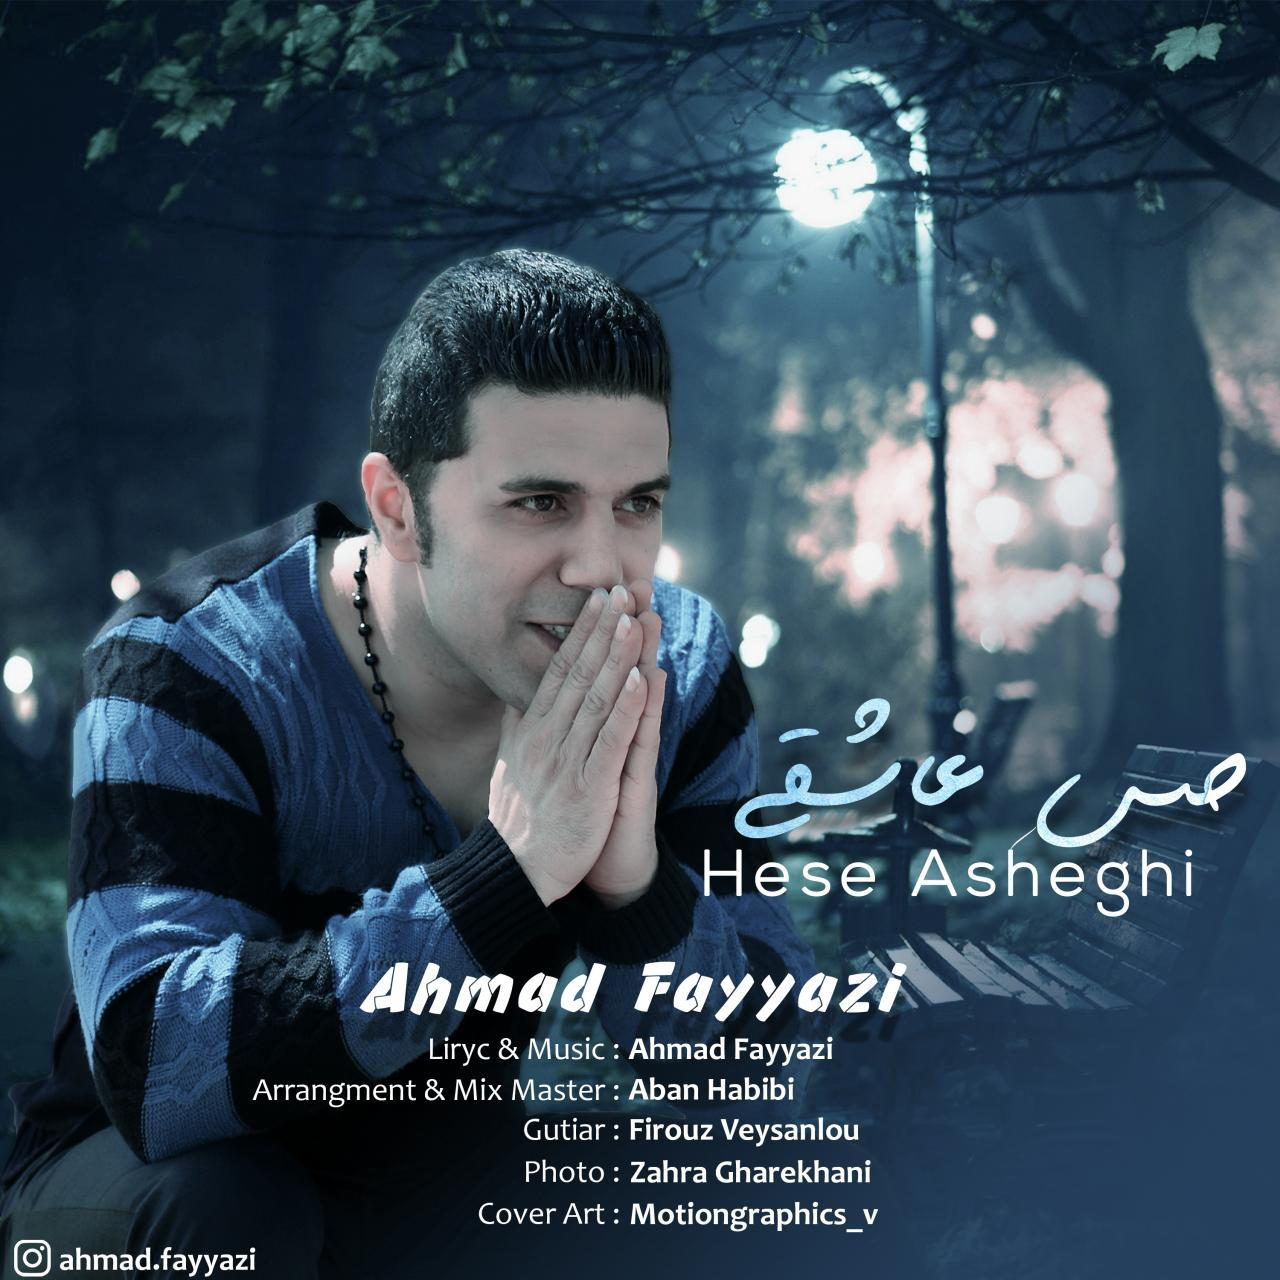 Ahmad Fayyazi – Hese Asheghi